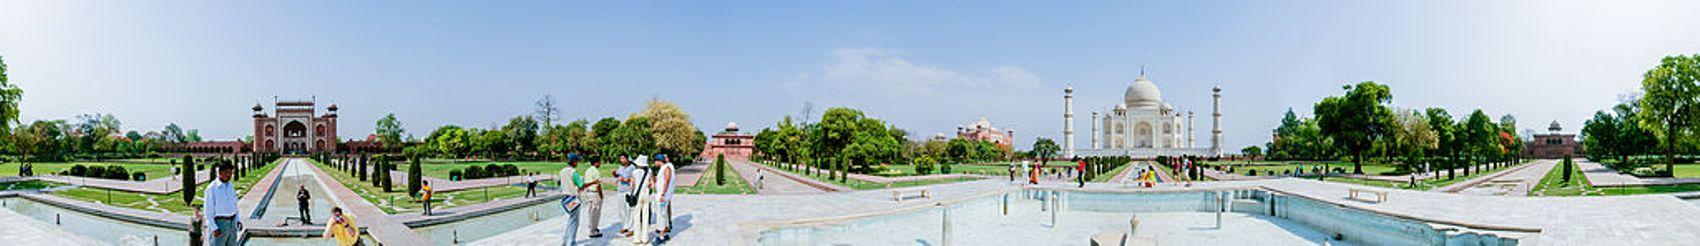 C:\Users\user\Pictures\Agra\1024px-Taj_Mahal,_Agra,_Uttar_Pradesh,_India_2005.jpg